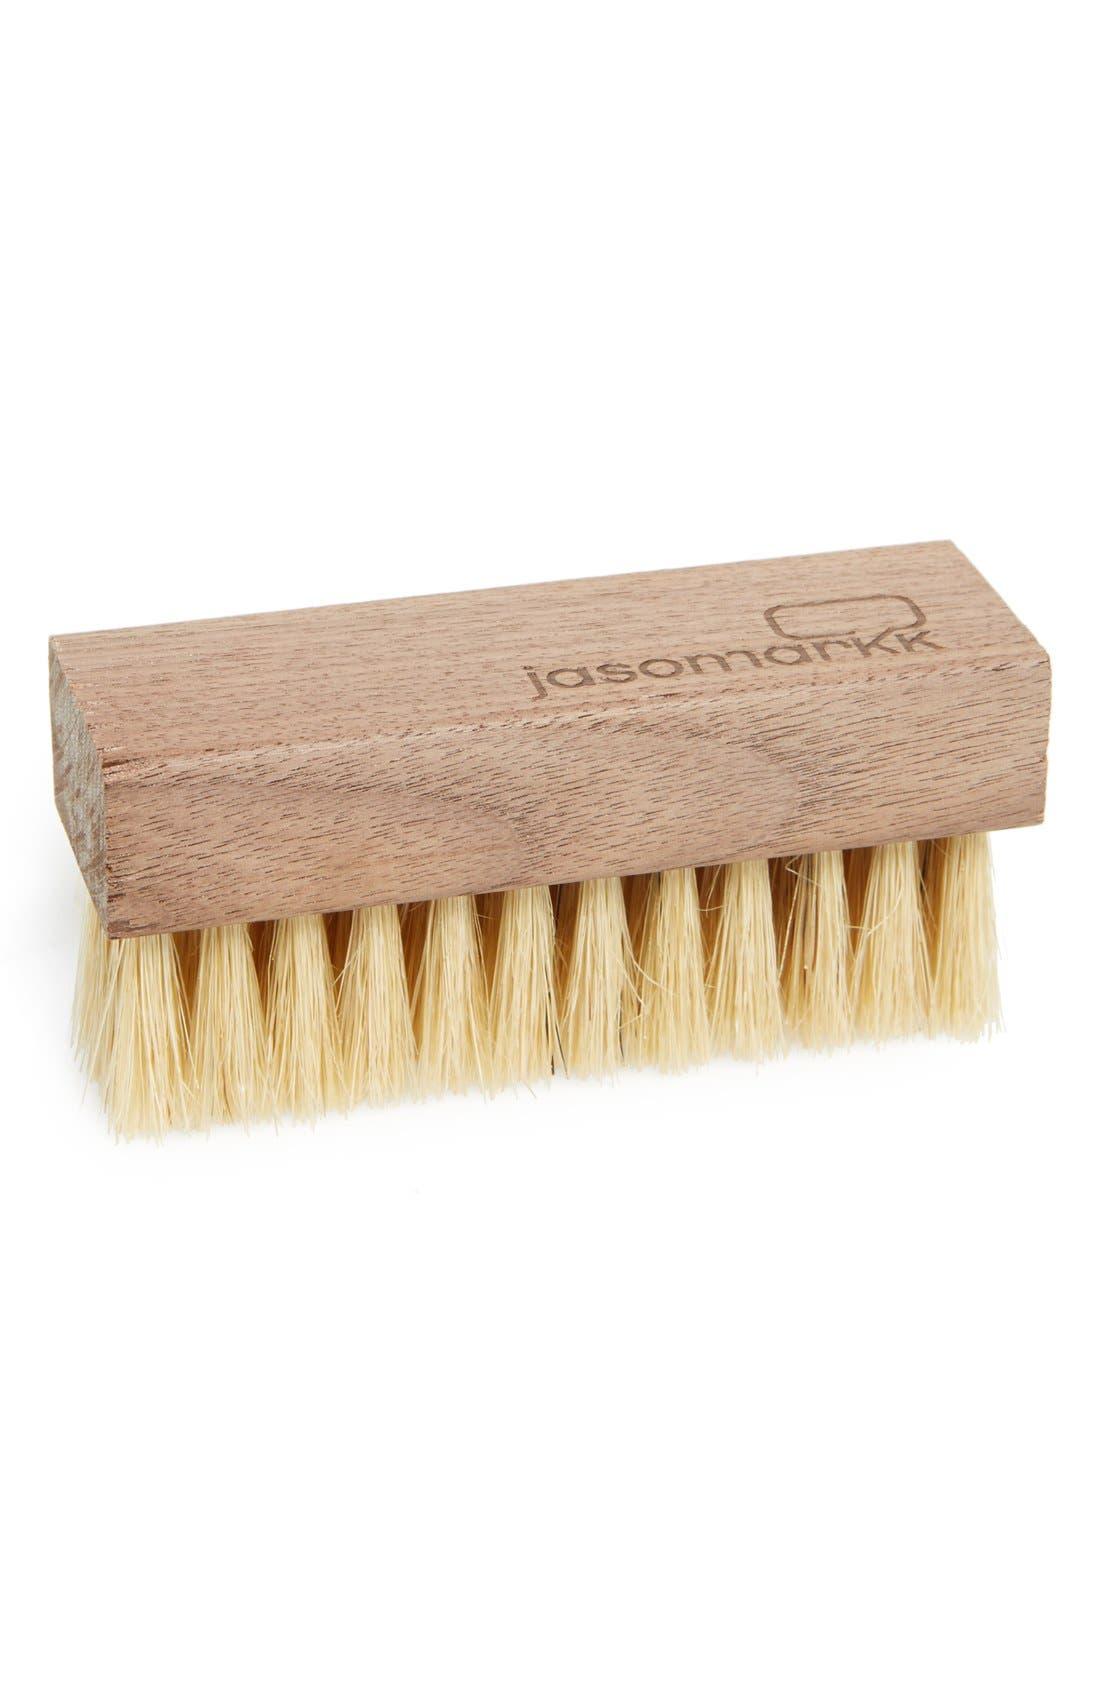 Premium Shoe Cleaning Brush,                             Main thumbnail 1, color,                             BROWN